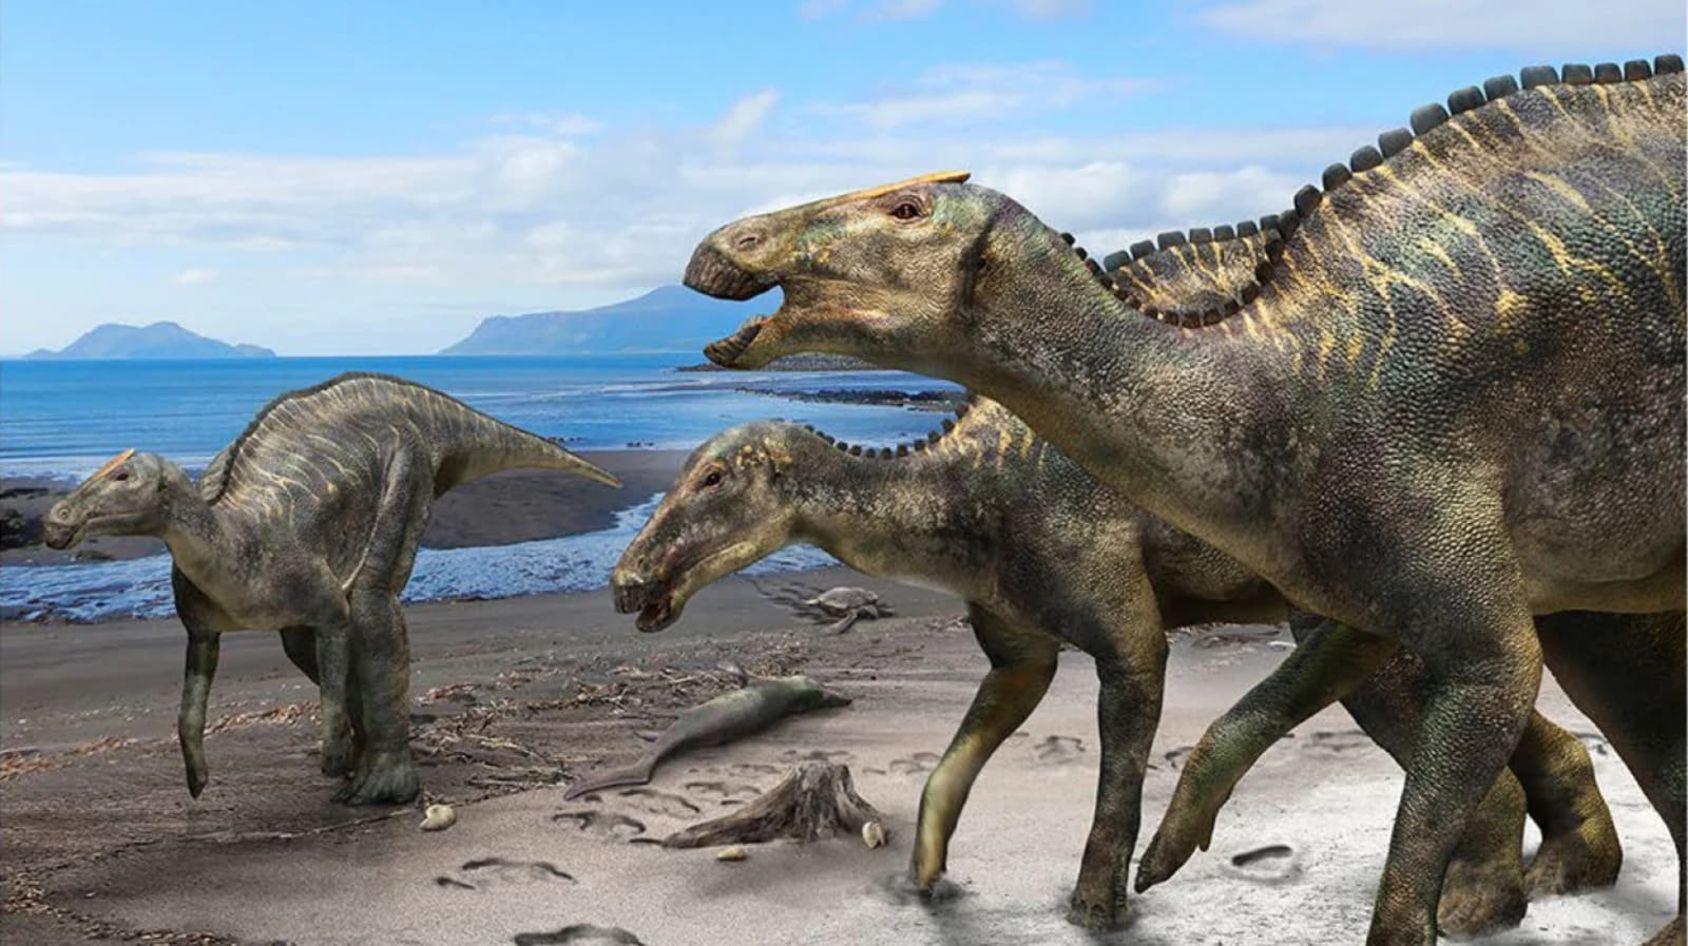 Tidigare okänd dinosaurieart hittad i Japan